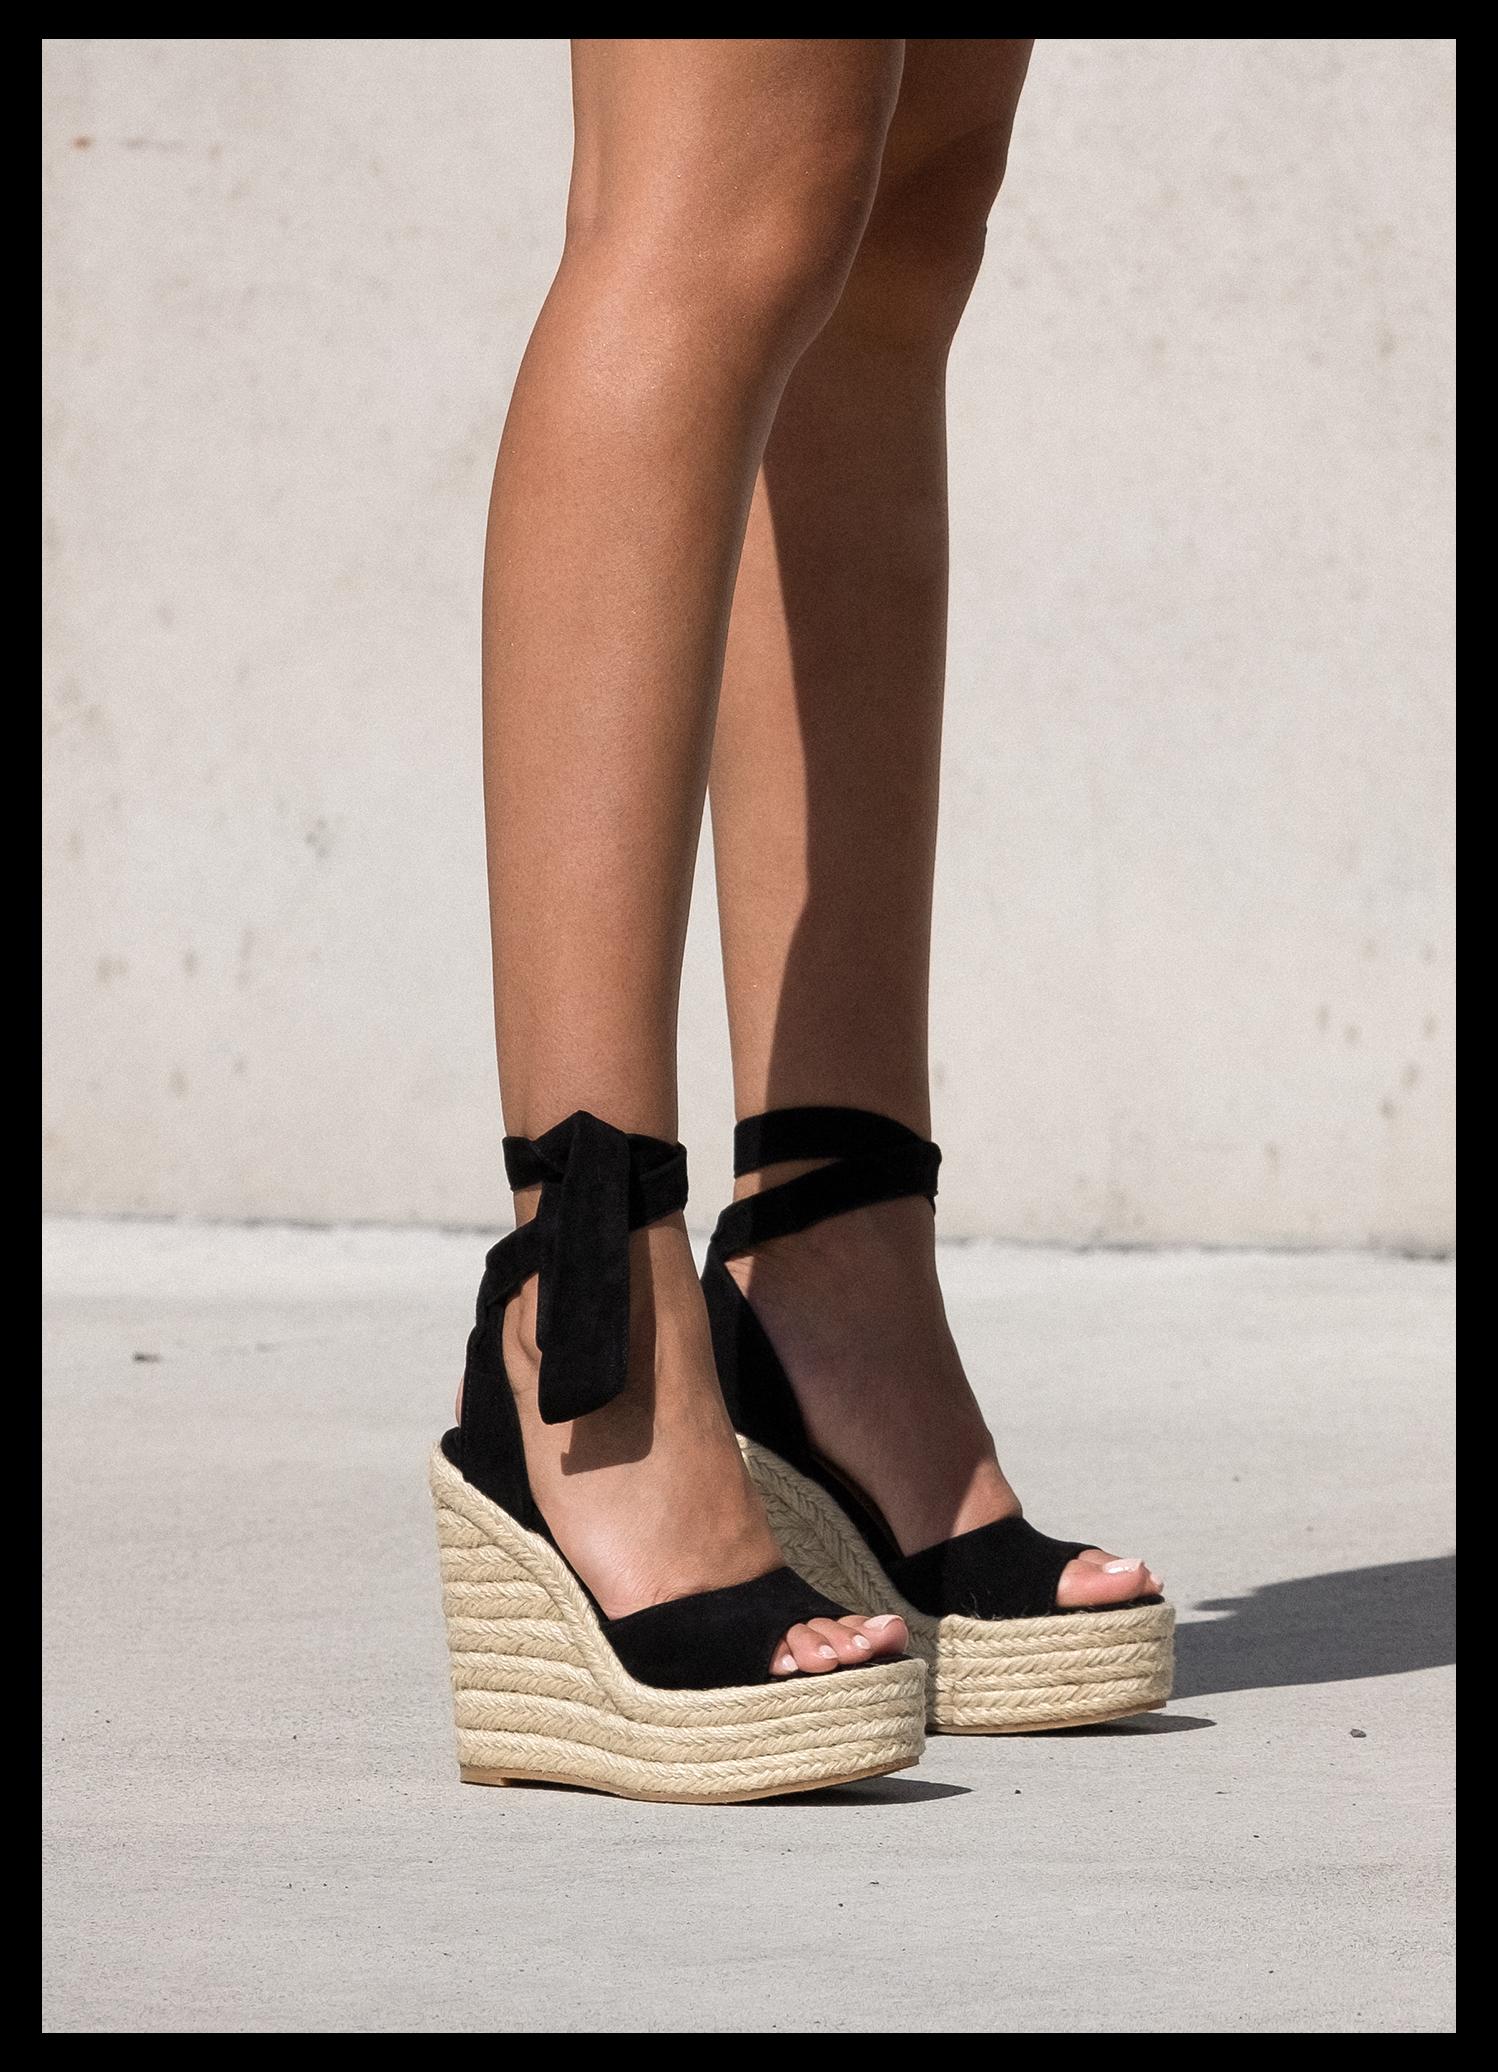 Barca Black Kid Suede Wedges Black Sandal Wedges Outfit Blacksandalwedgesoutfit In 2021 Girly Shoes Shoes Cute Shoes Heels [ 2072 x 1498 Pixel ]